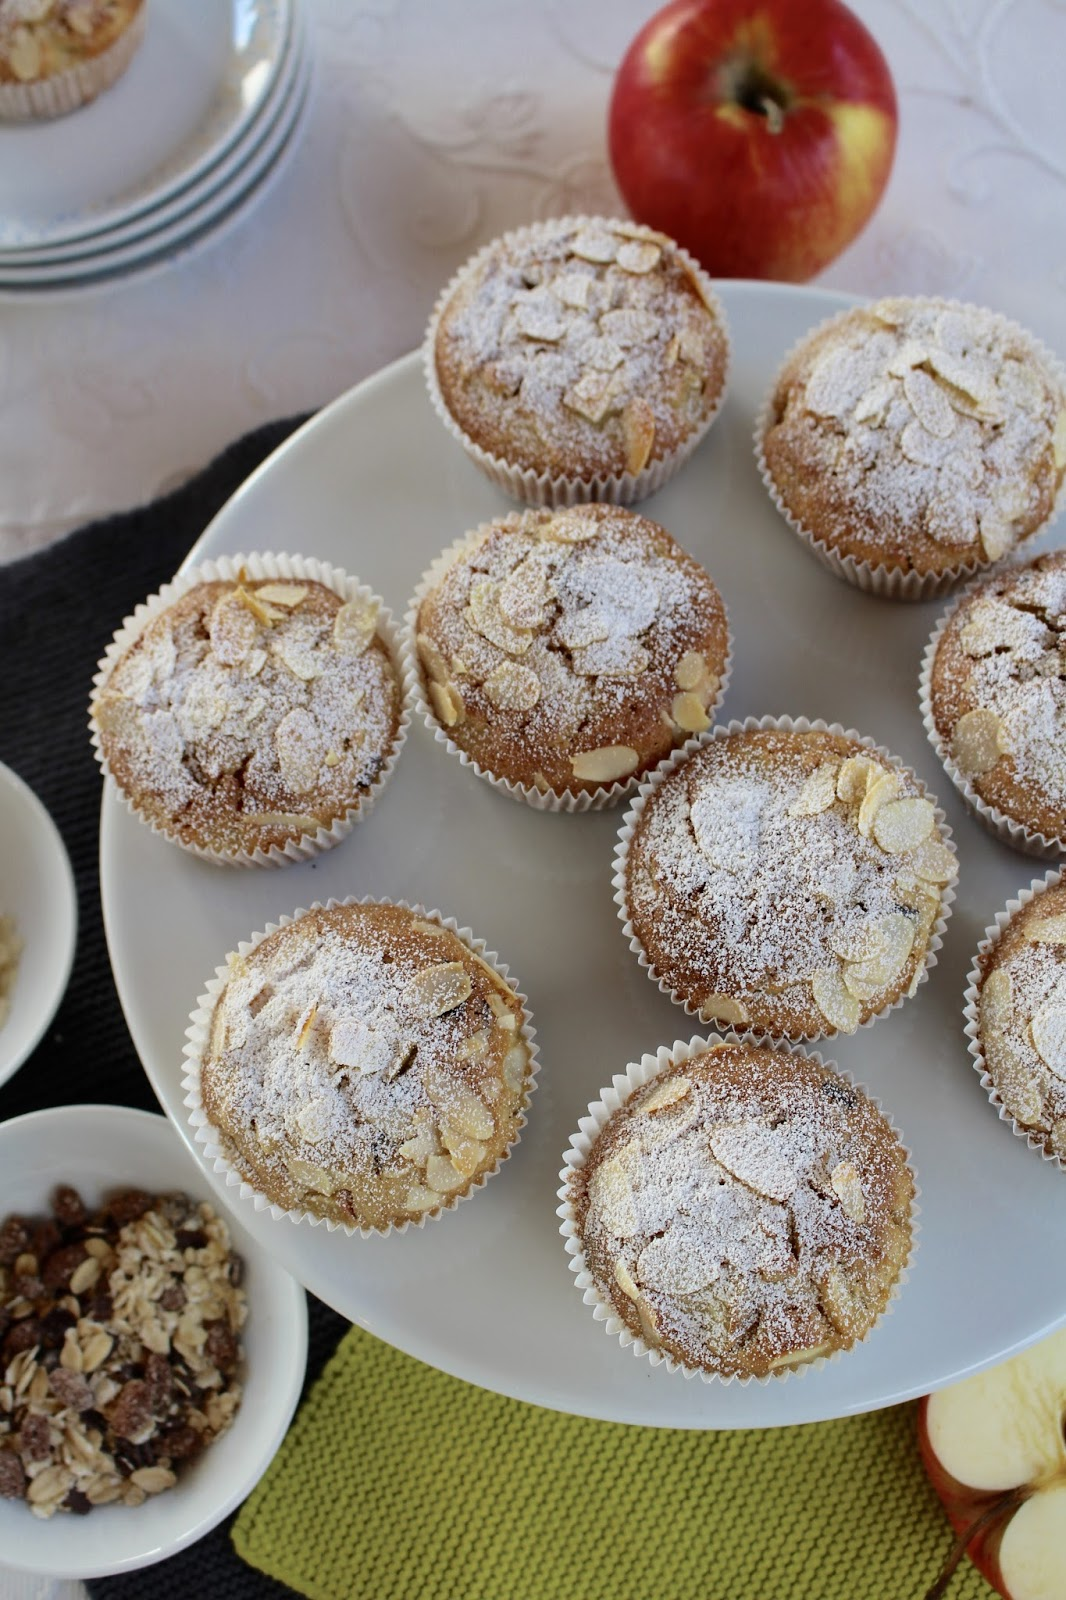 Apfel Schokoladen Müsli Muffins